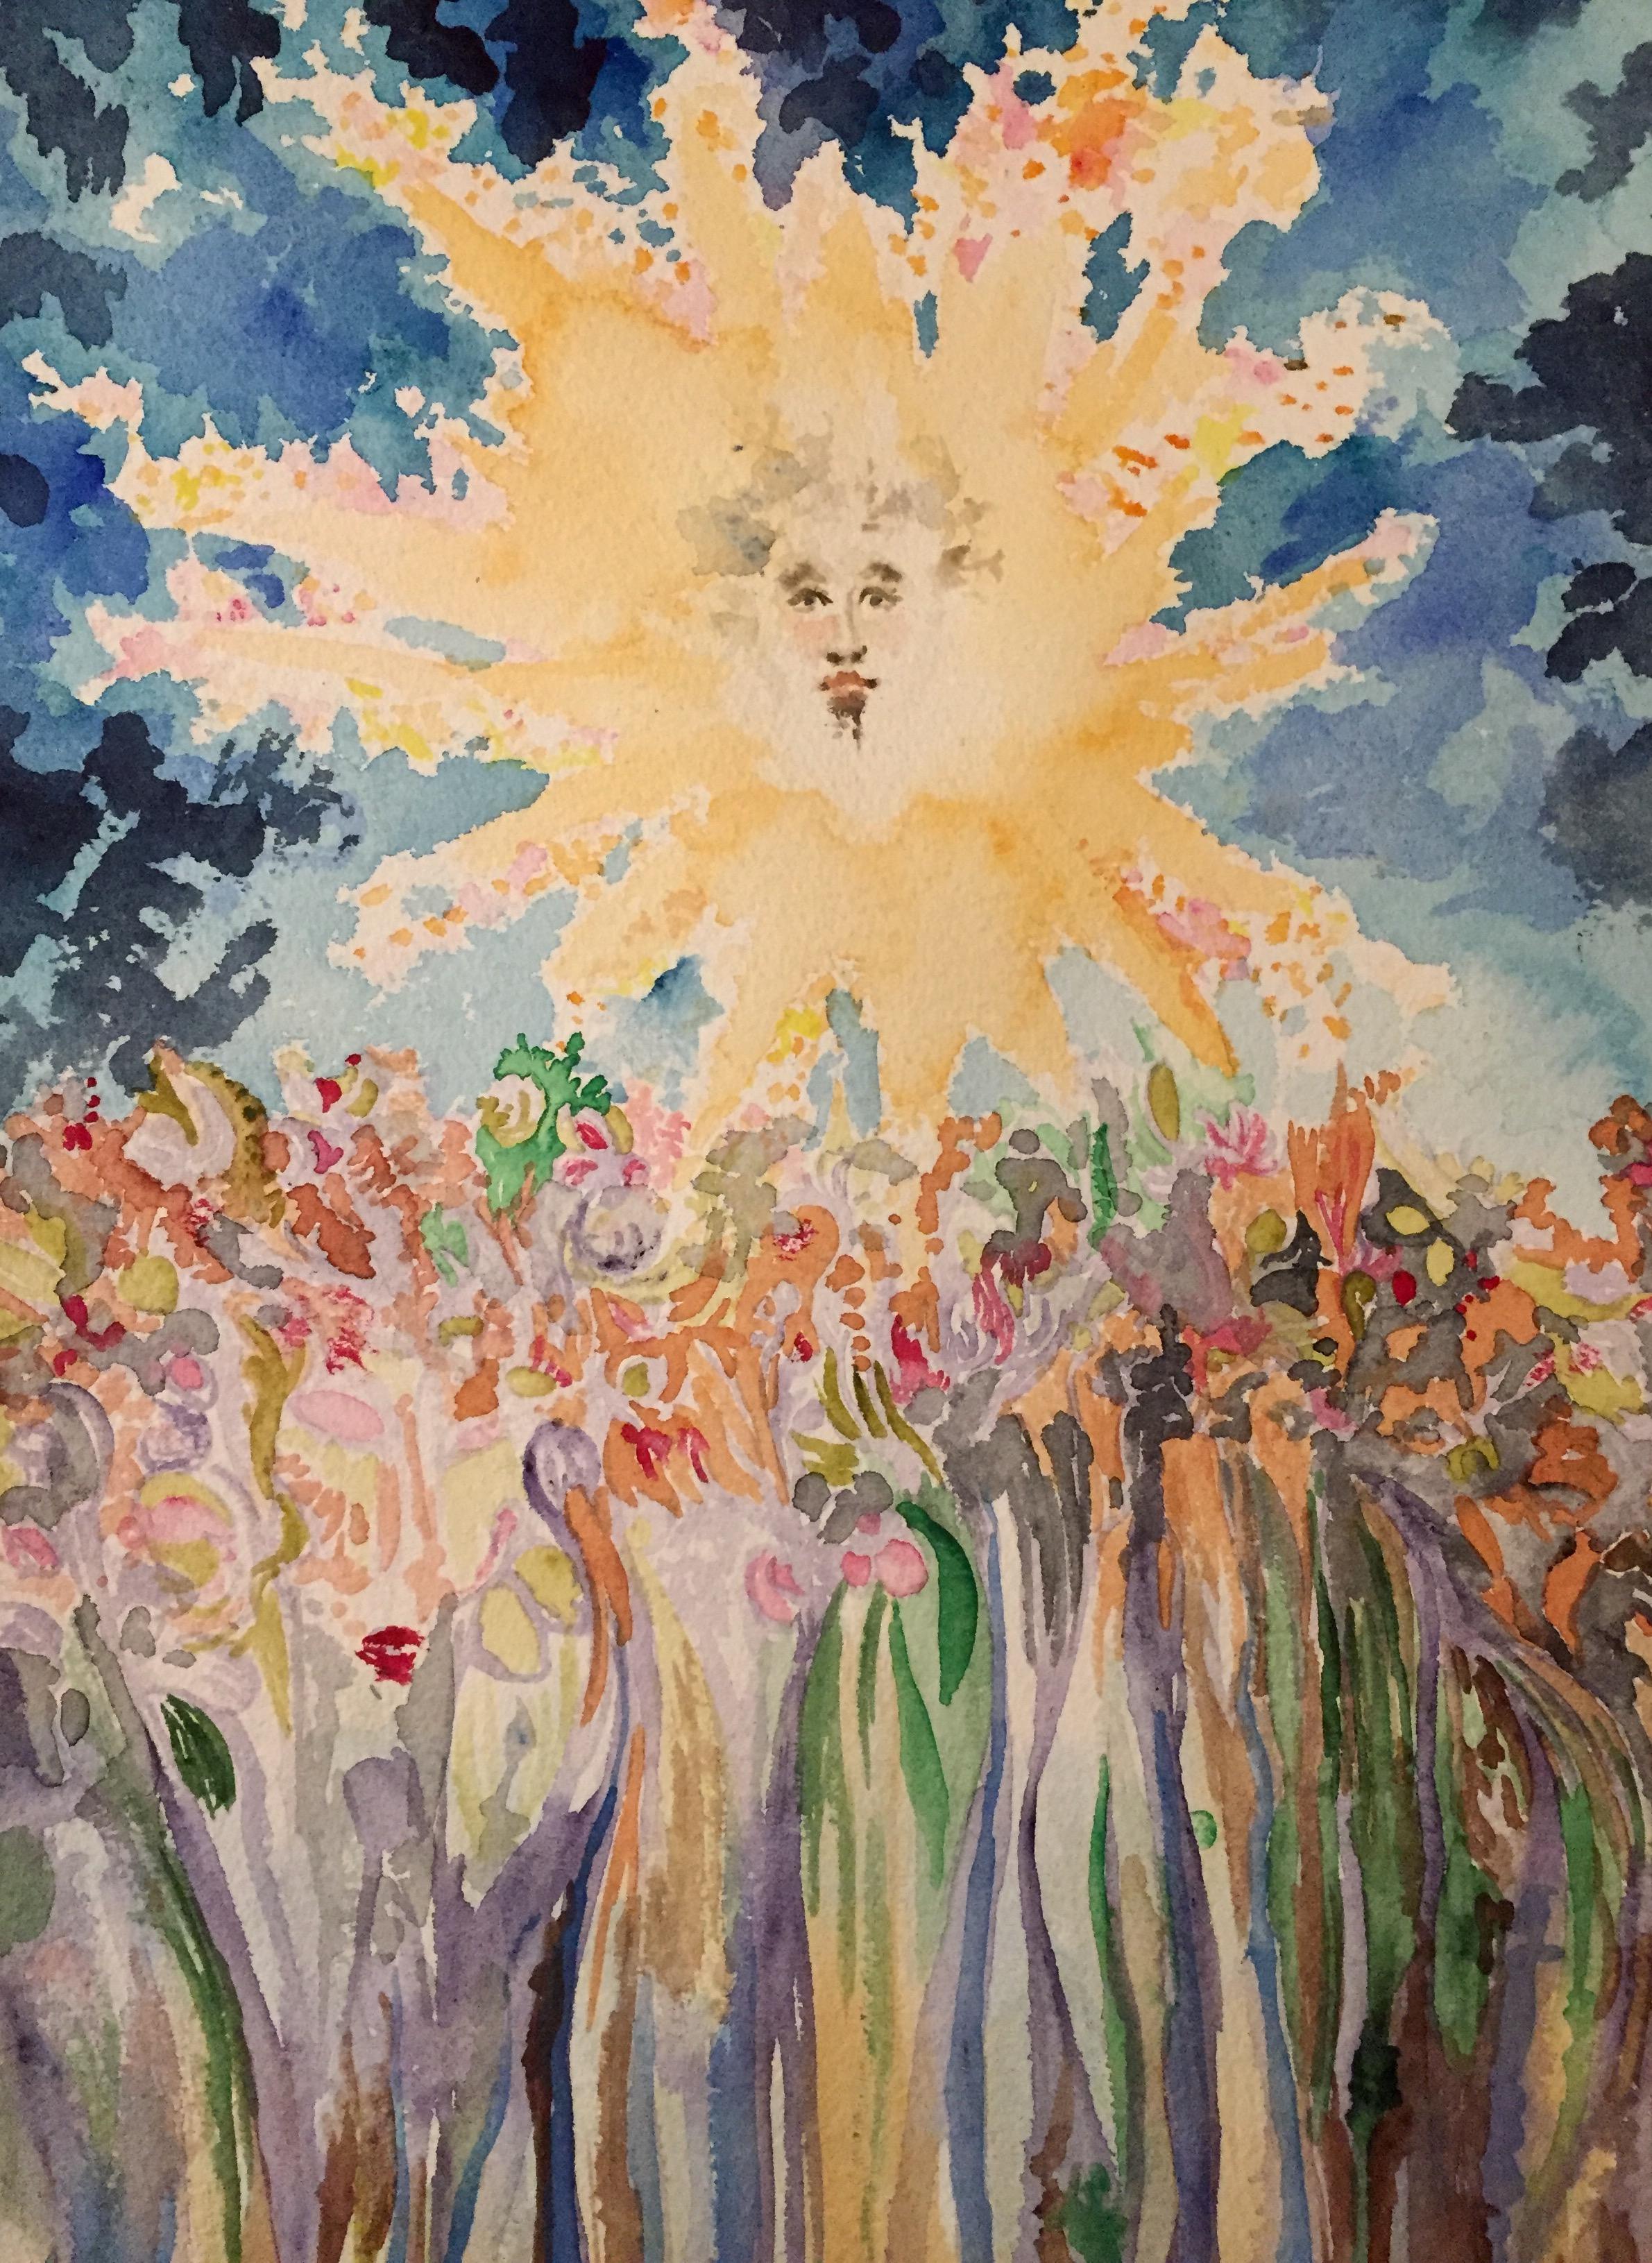 Sun, head of a man and flower field